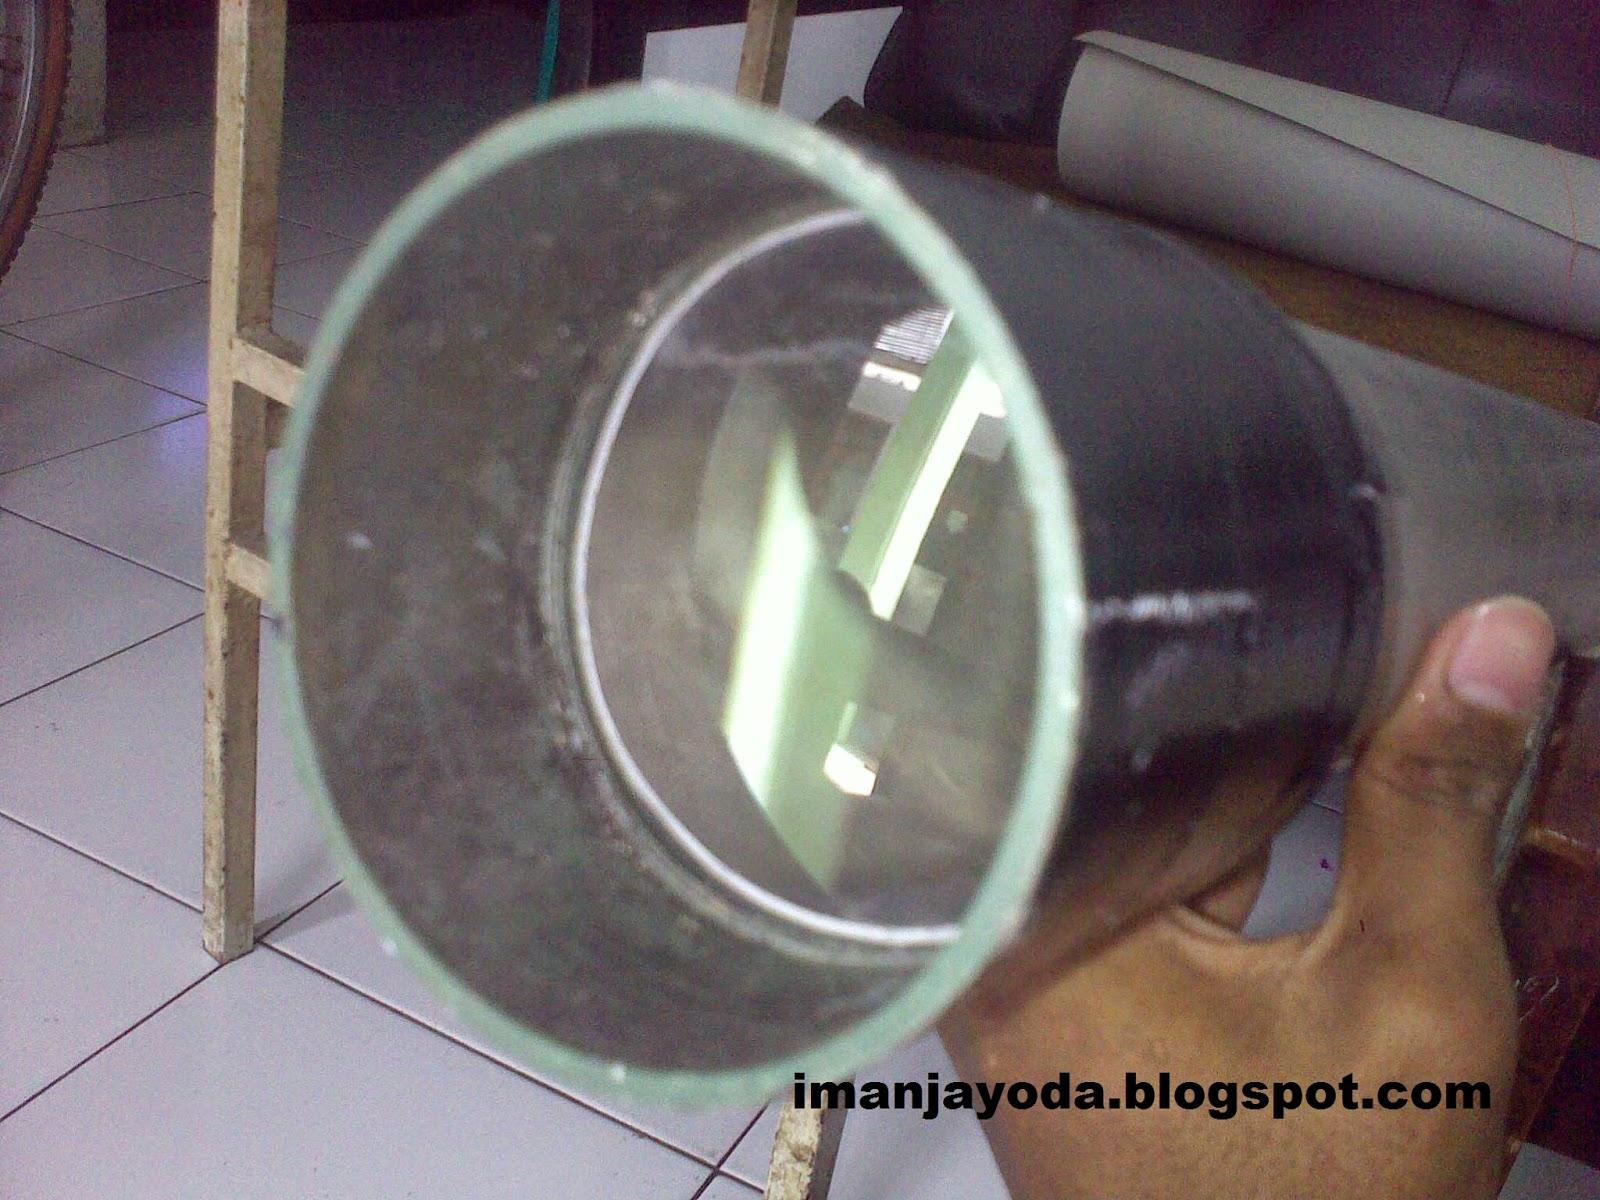 Belajar membuat teleskop bintang sederhana iman jayoda